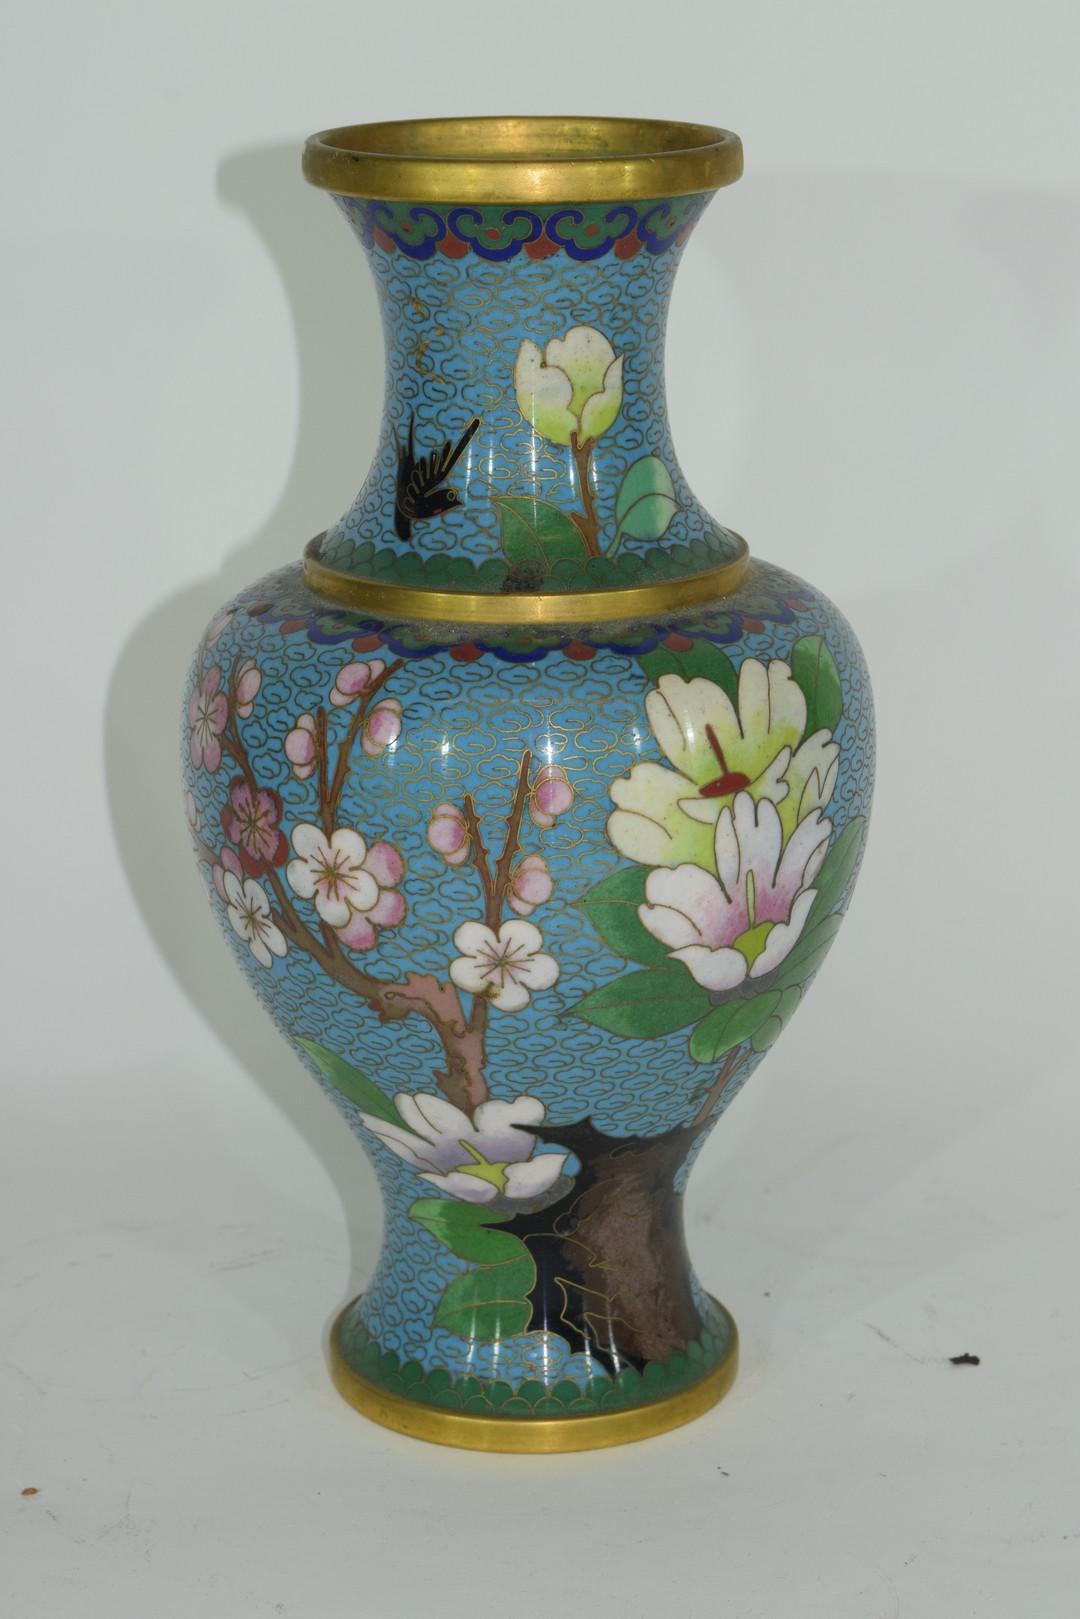 Cloisonne vase